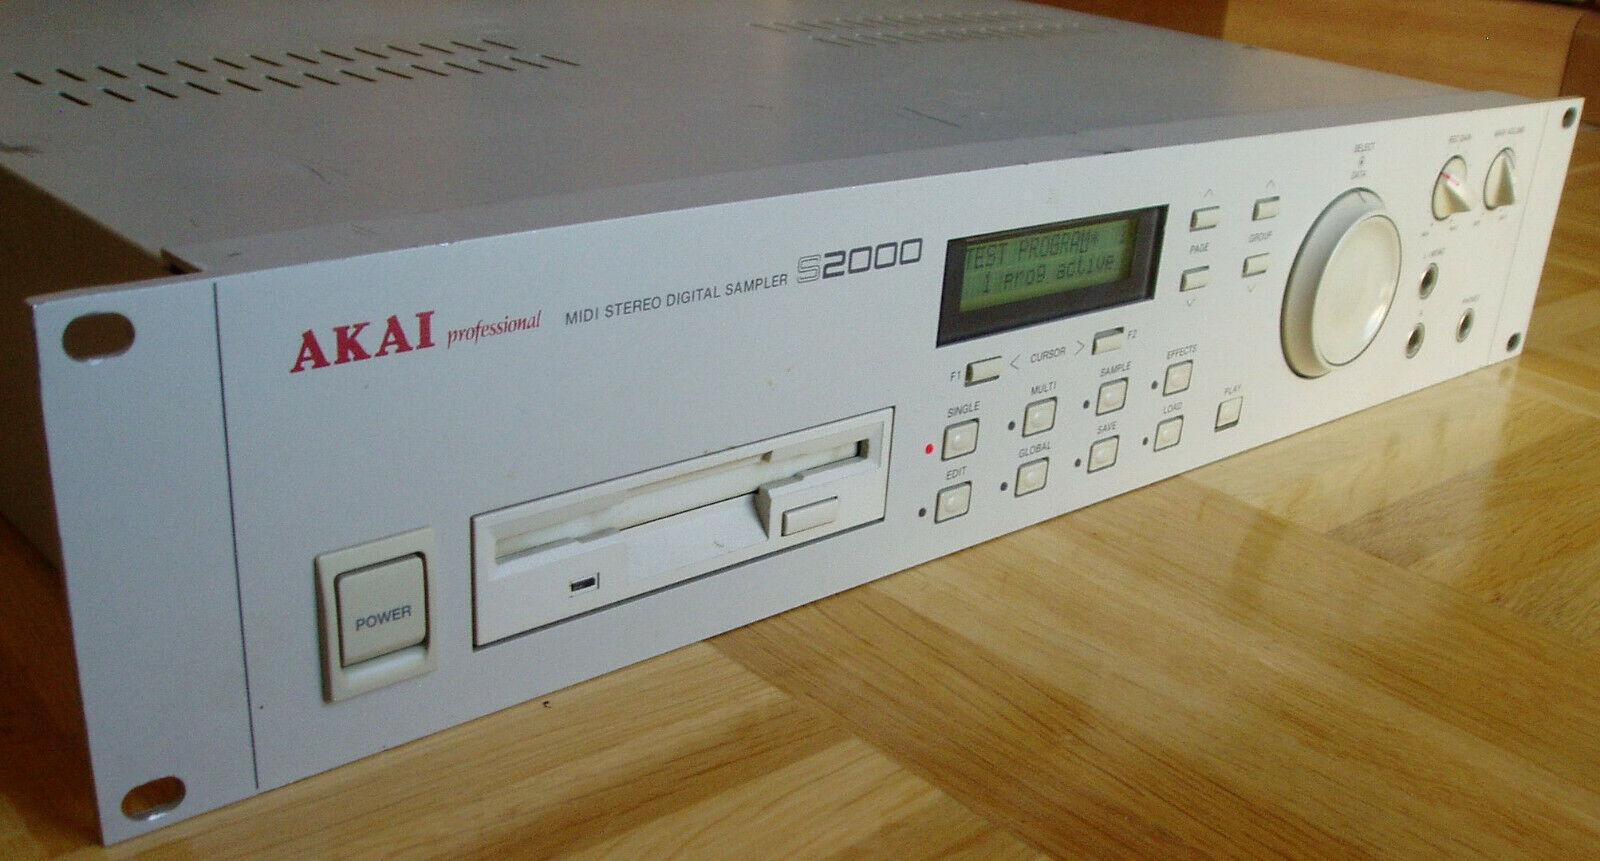 Akai S2000 Sampler mit 32 MB RAM   - RECHNUNG - GEWÄHRLEISTUNG -